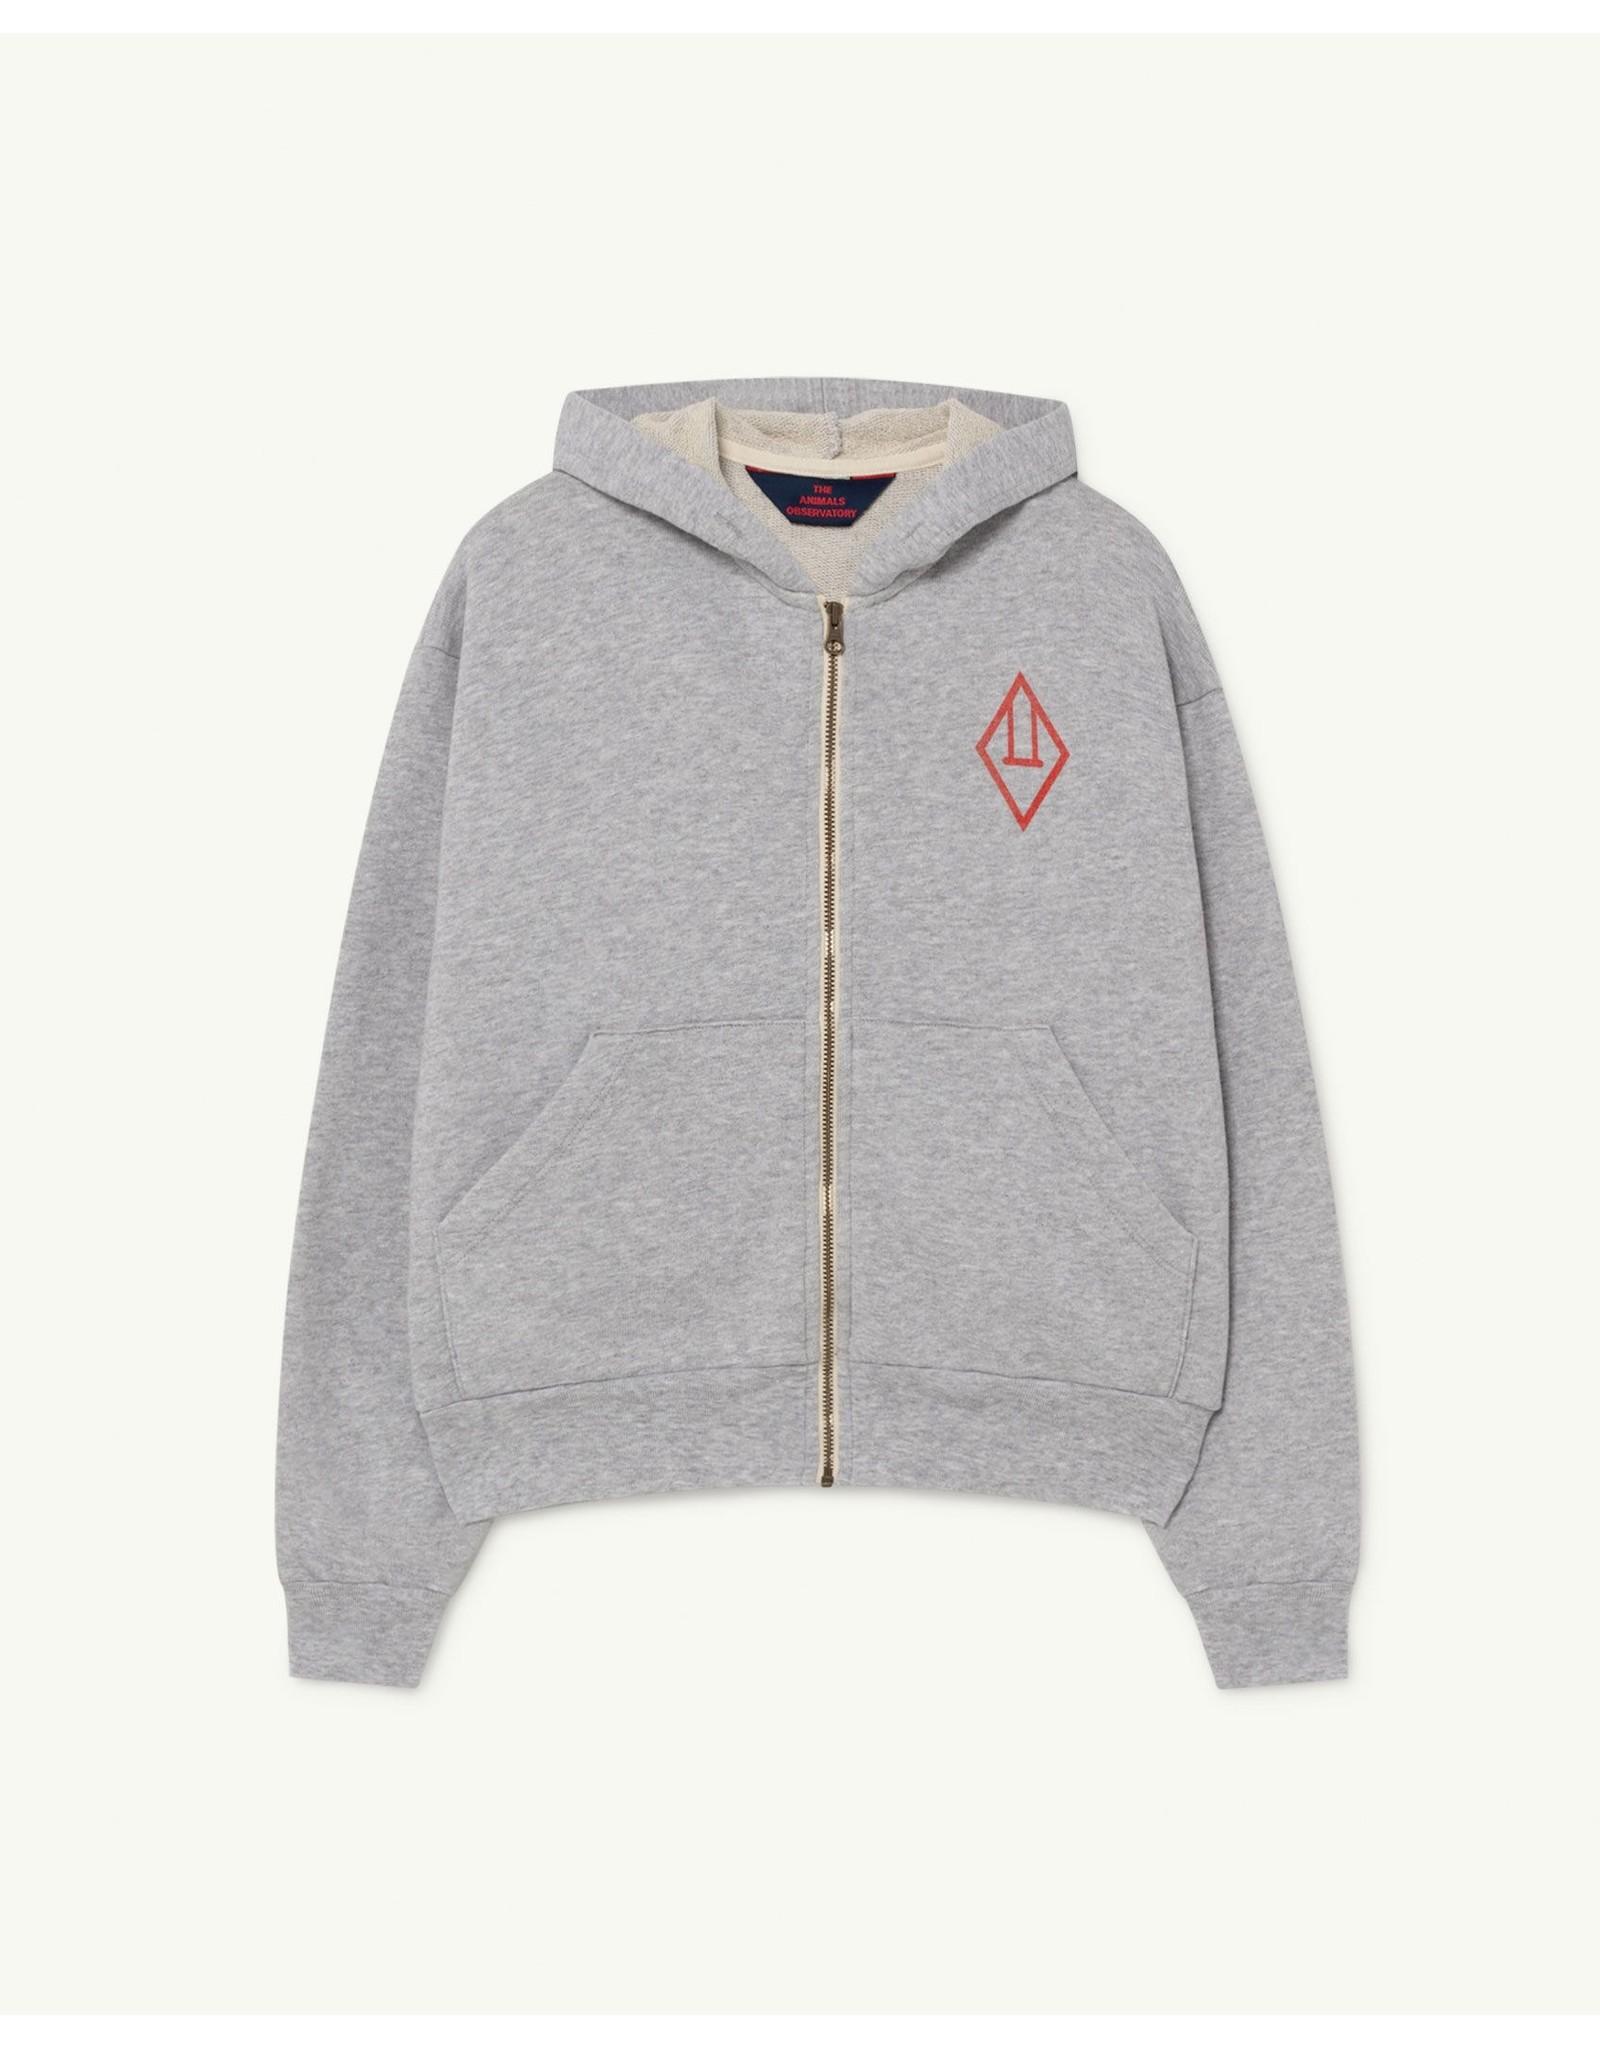 TAO SS21046 Seahorse sweatshirt grey